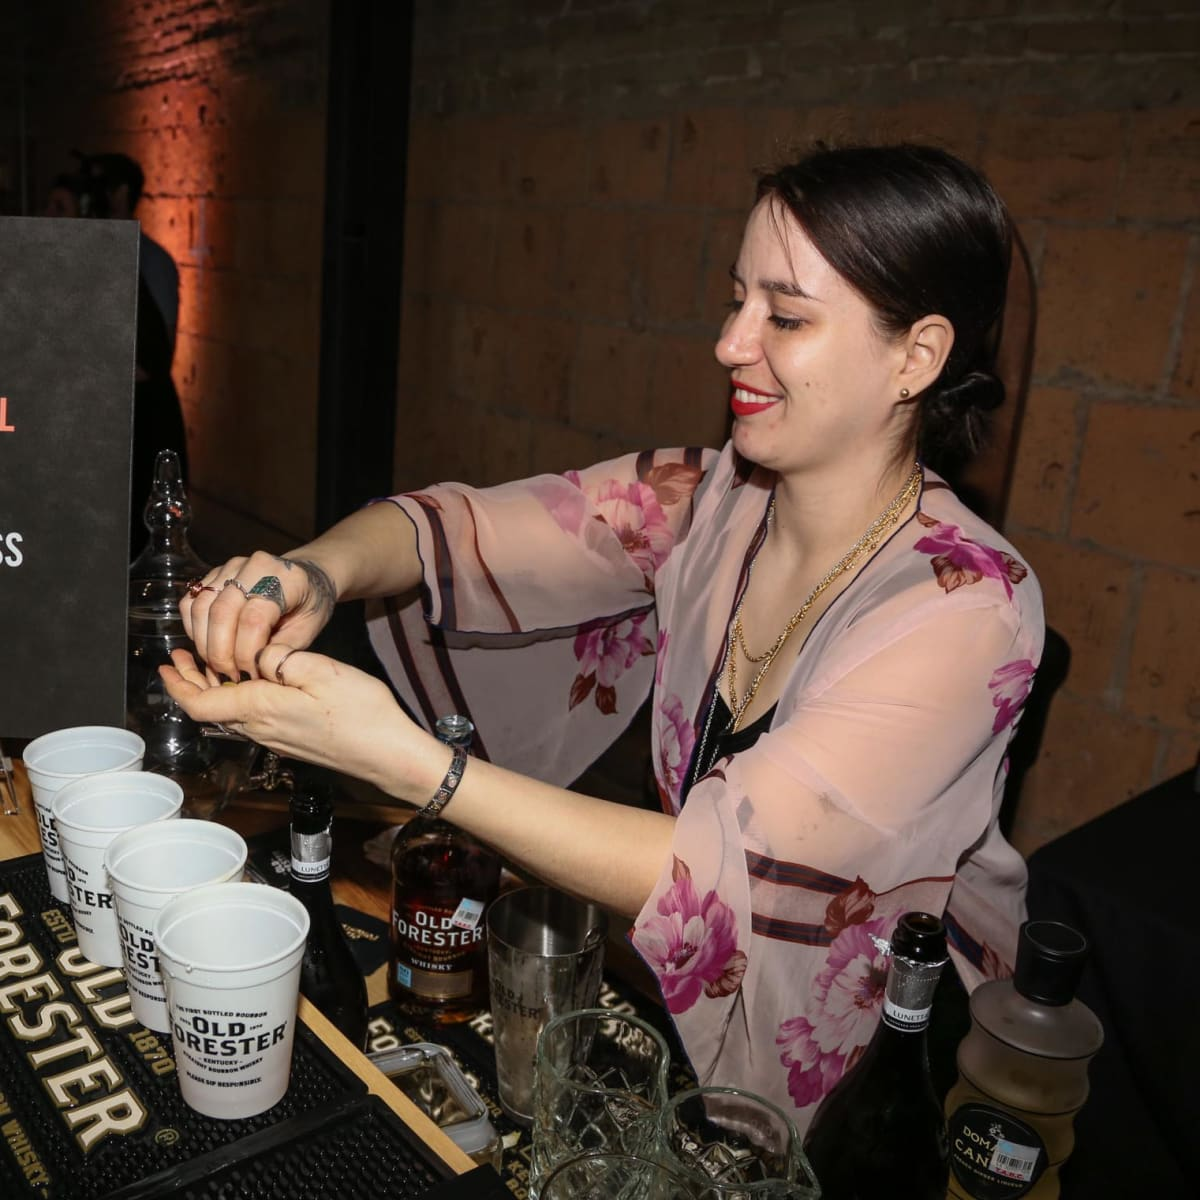 CultureMap Old Forester Bourbon Ball 2016 Aisling Gammill Whistler's